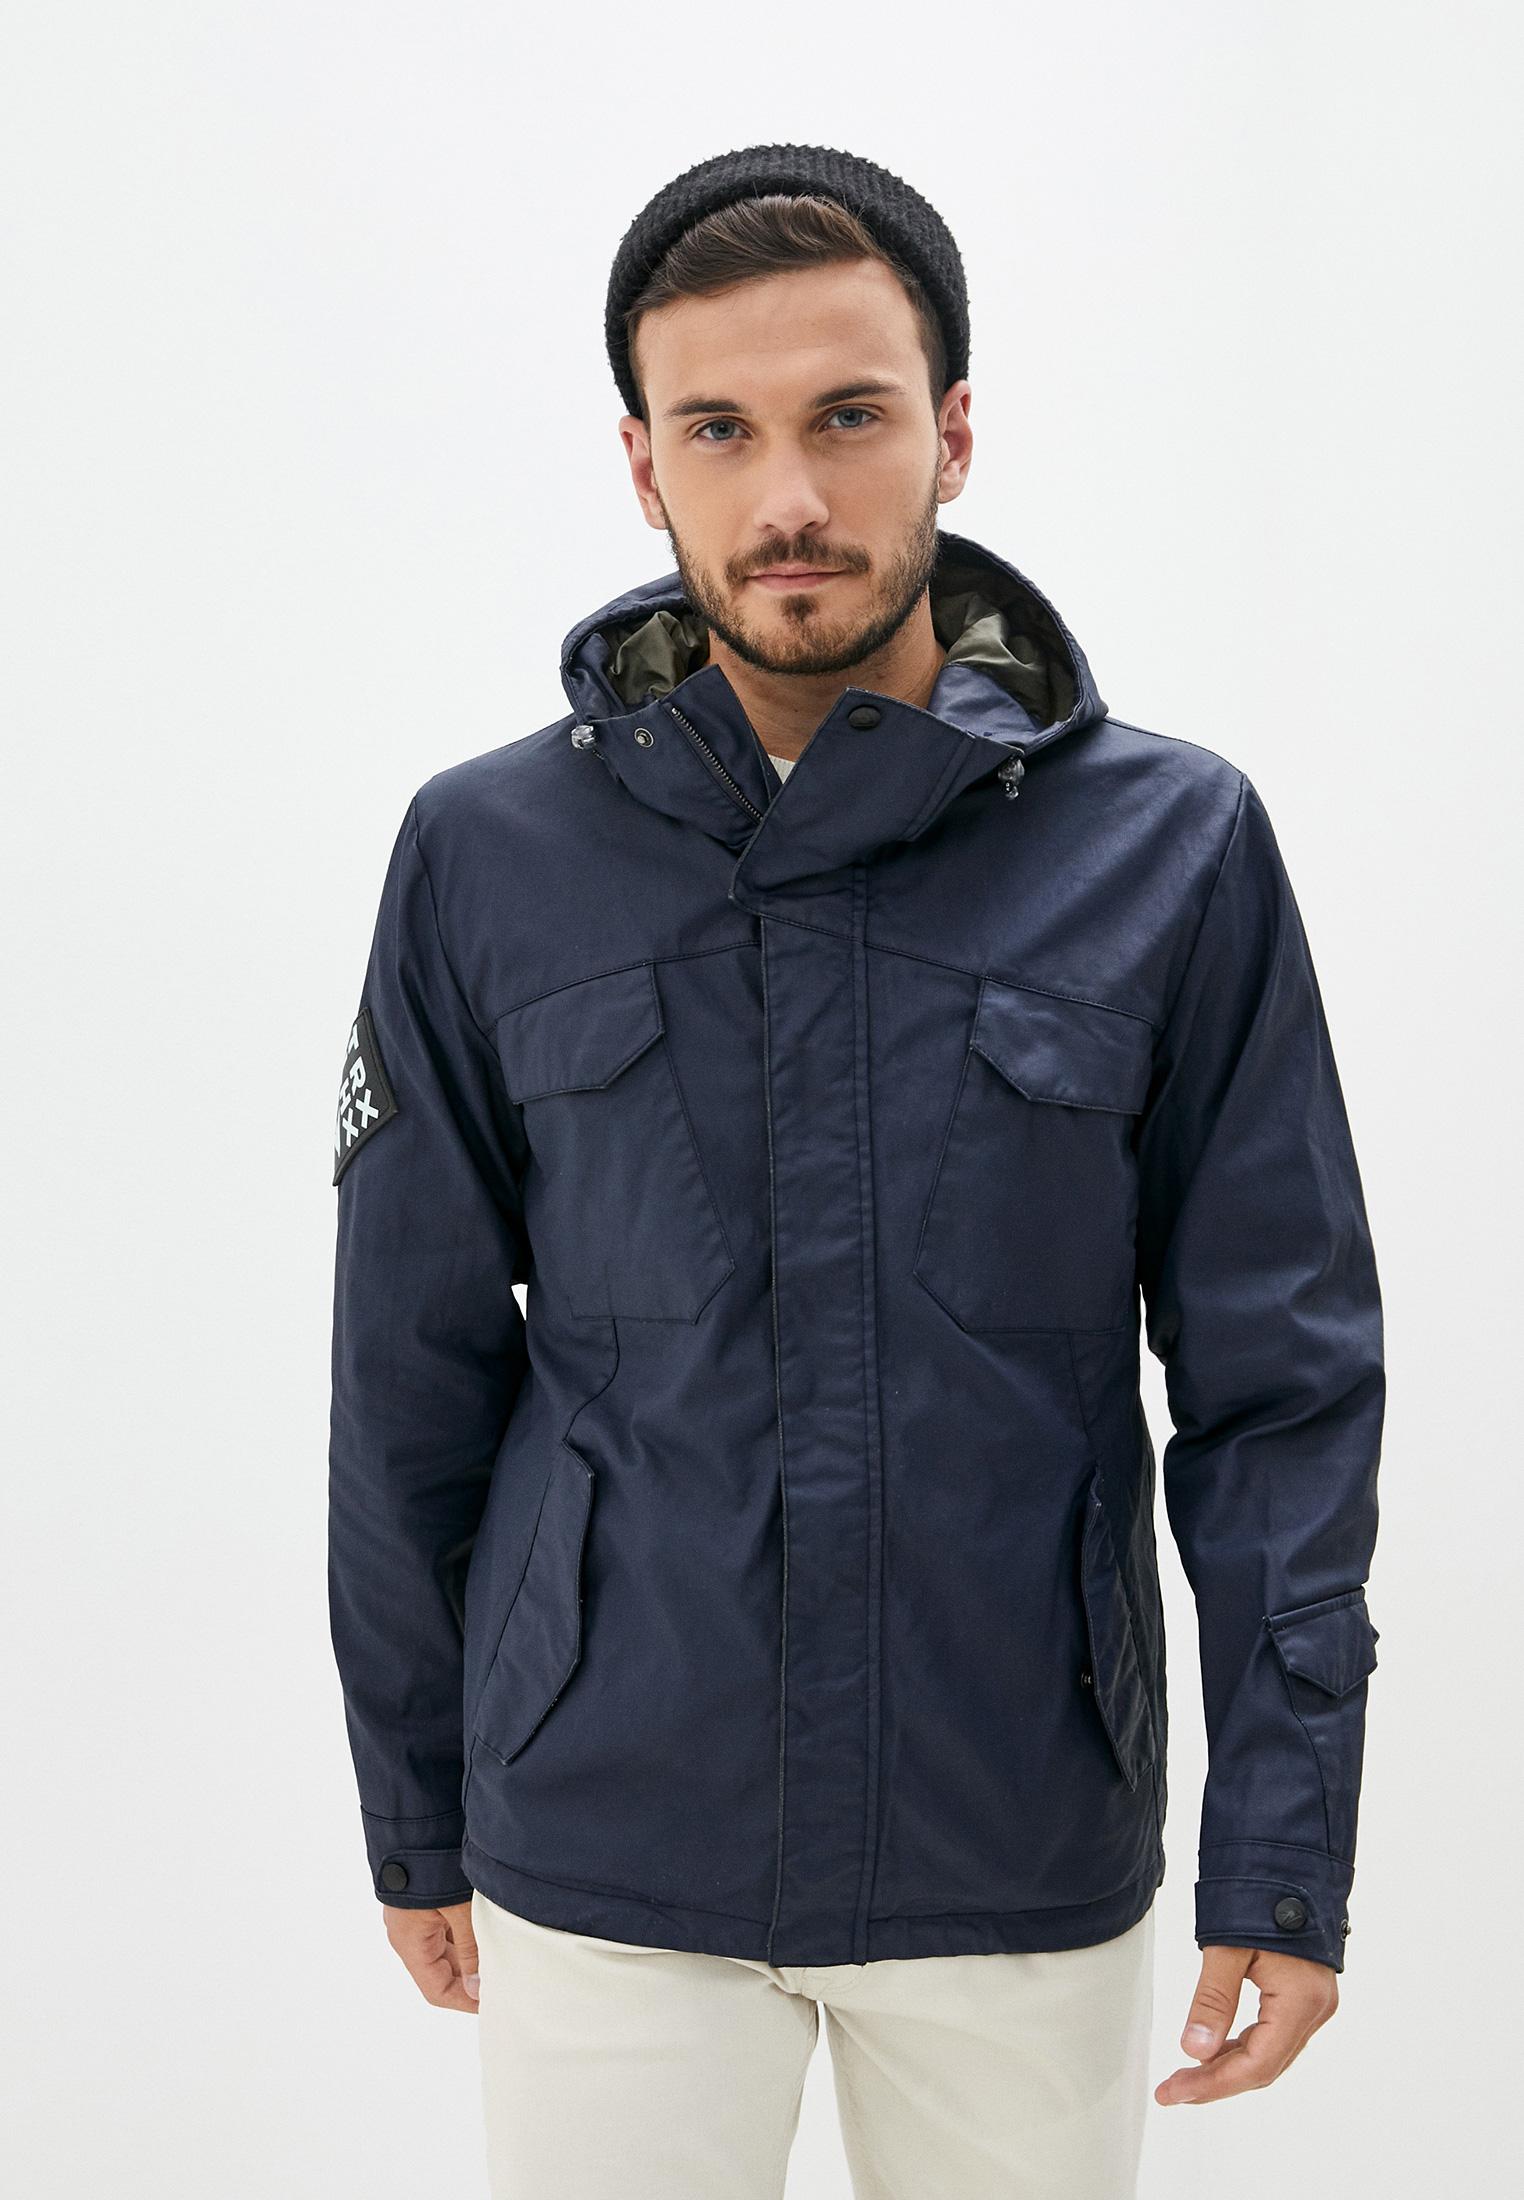 Мужская верхняя одежда Trailhead MJK512